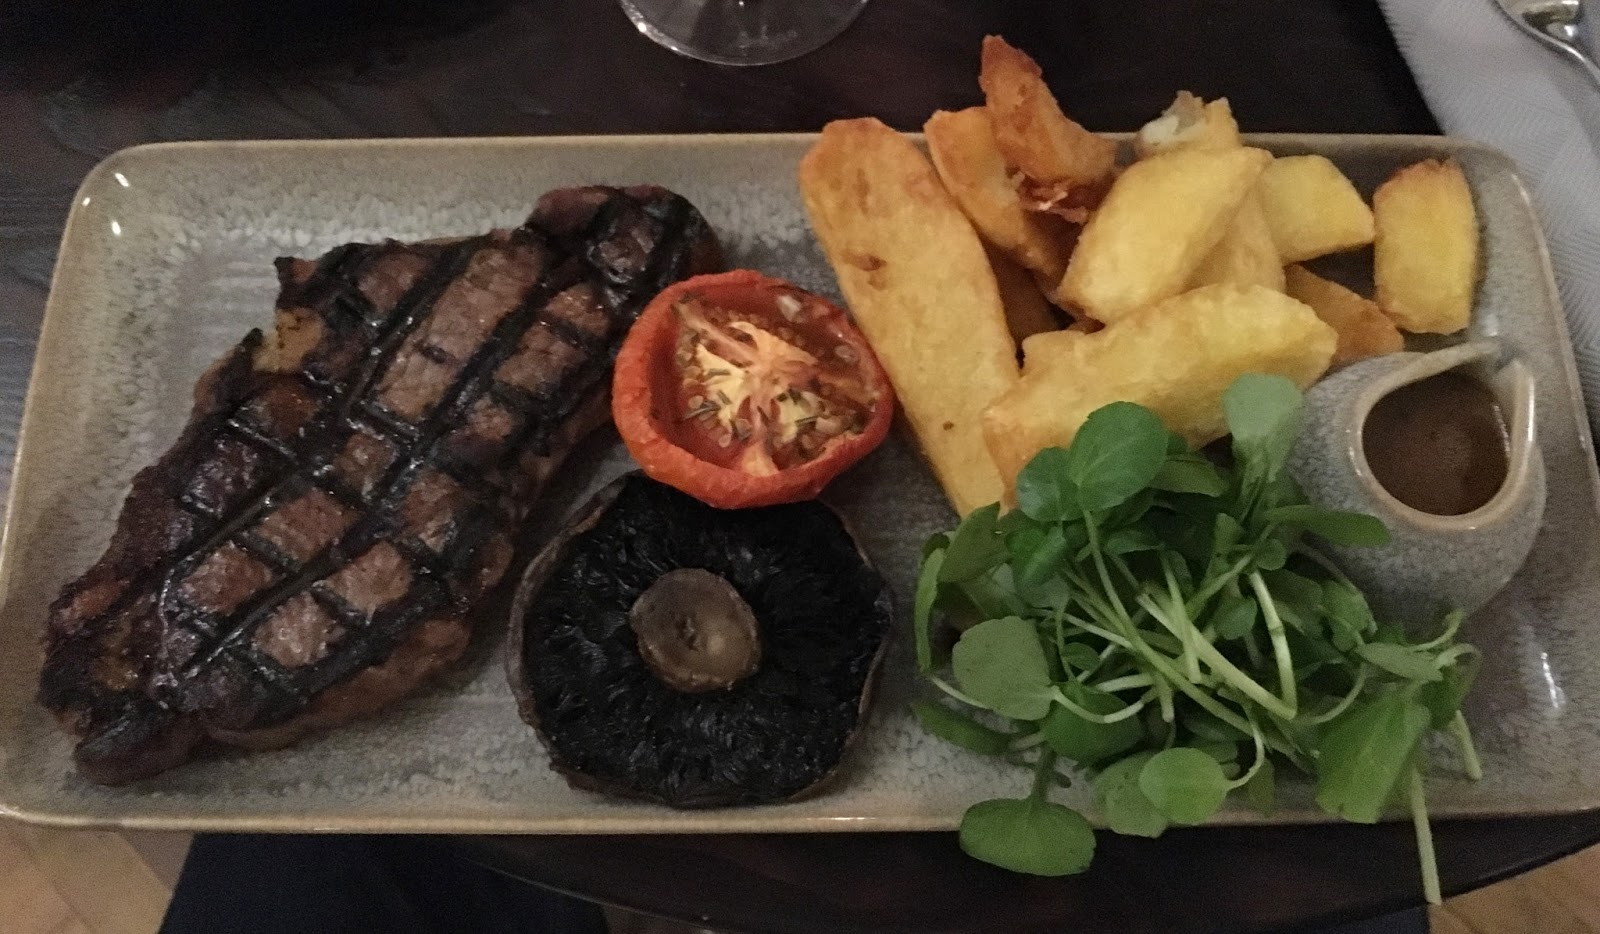 Prime restaurant, Stirk House, Gisburn, steak main course